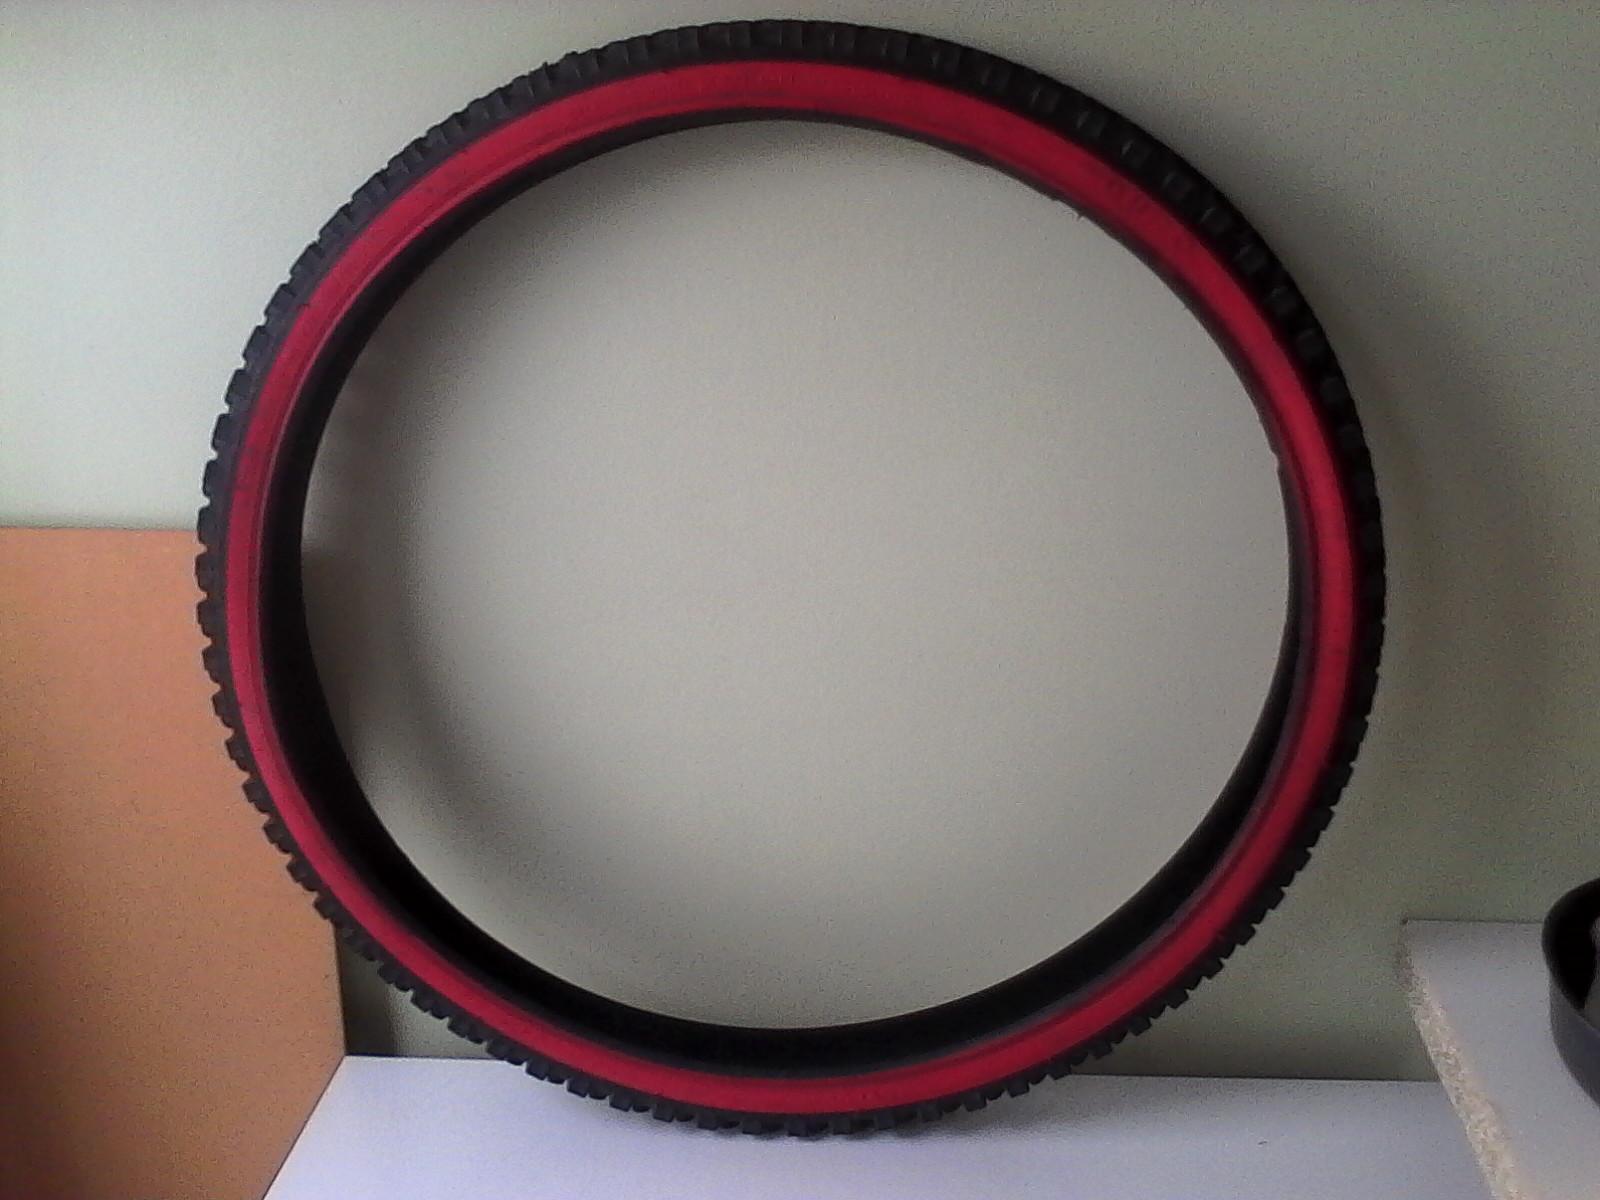 troc de troc pneus duro diamond grip image 0